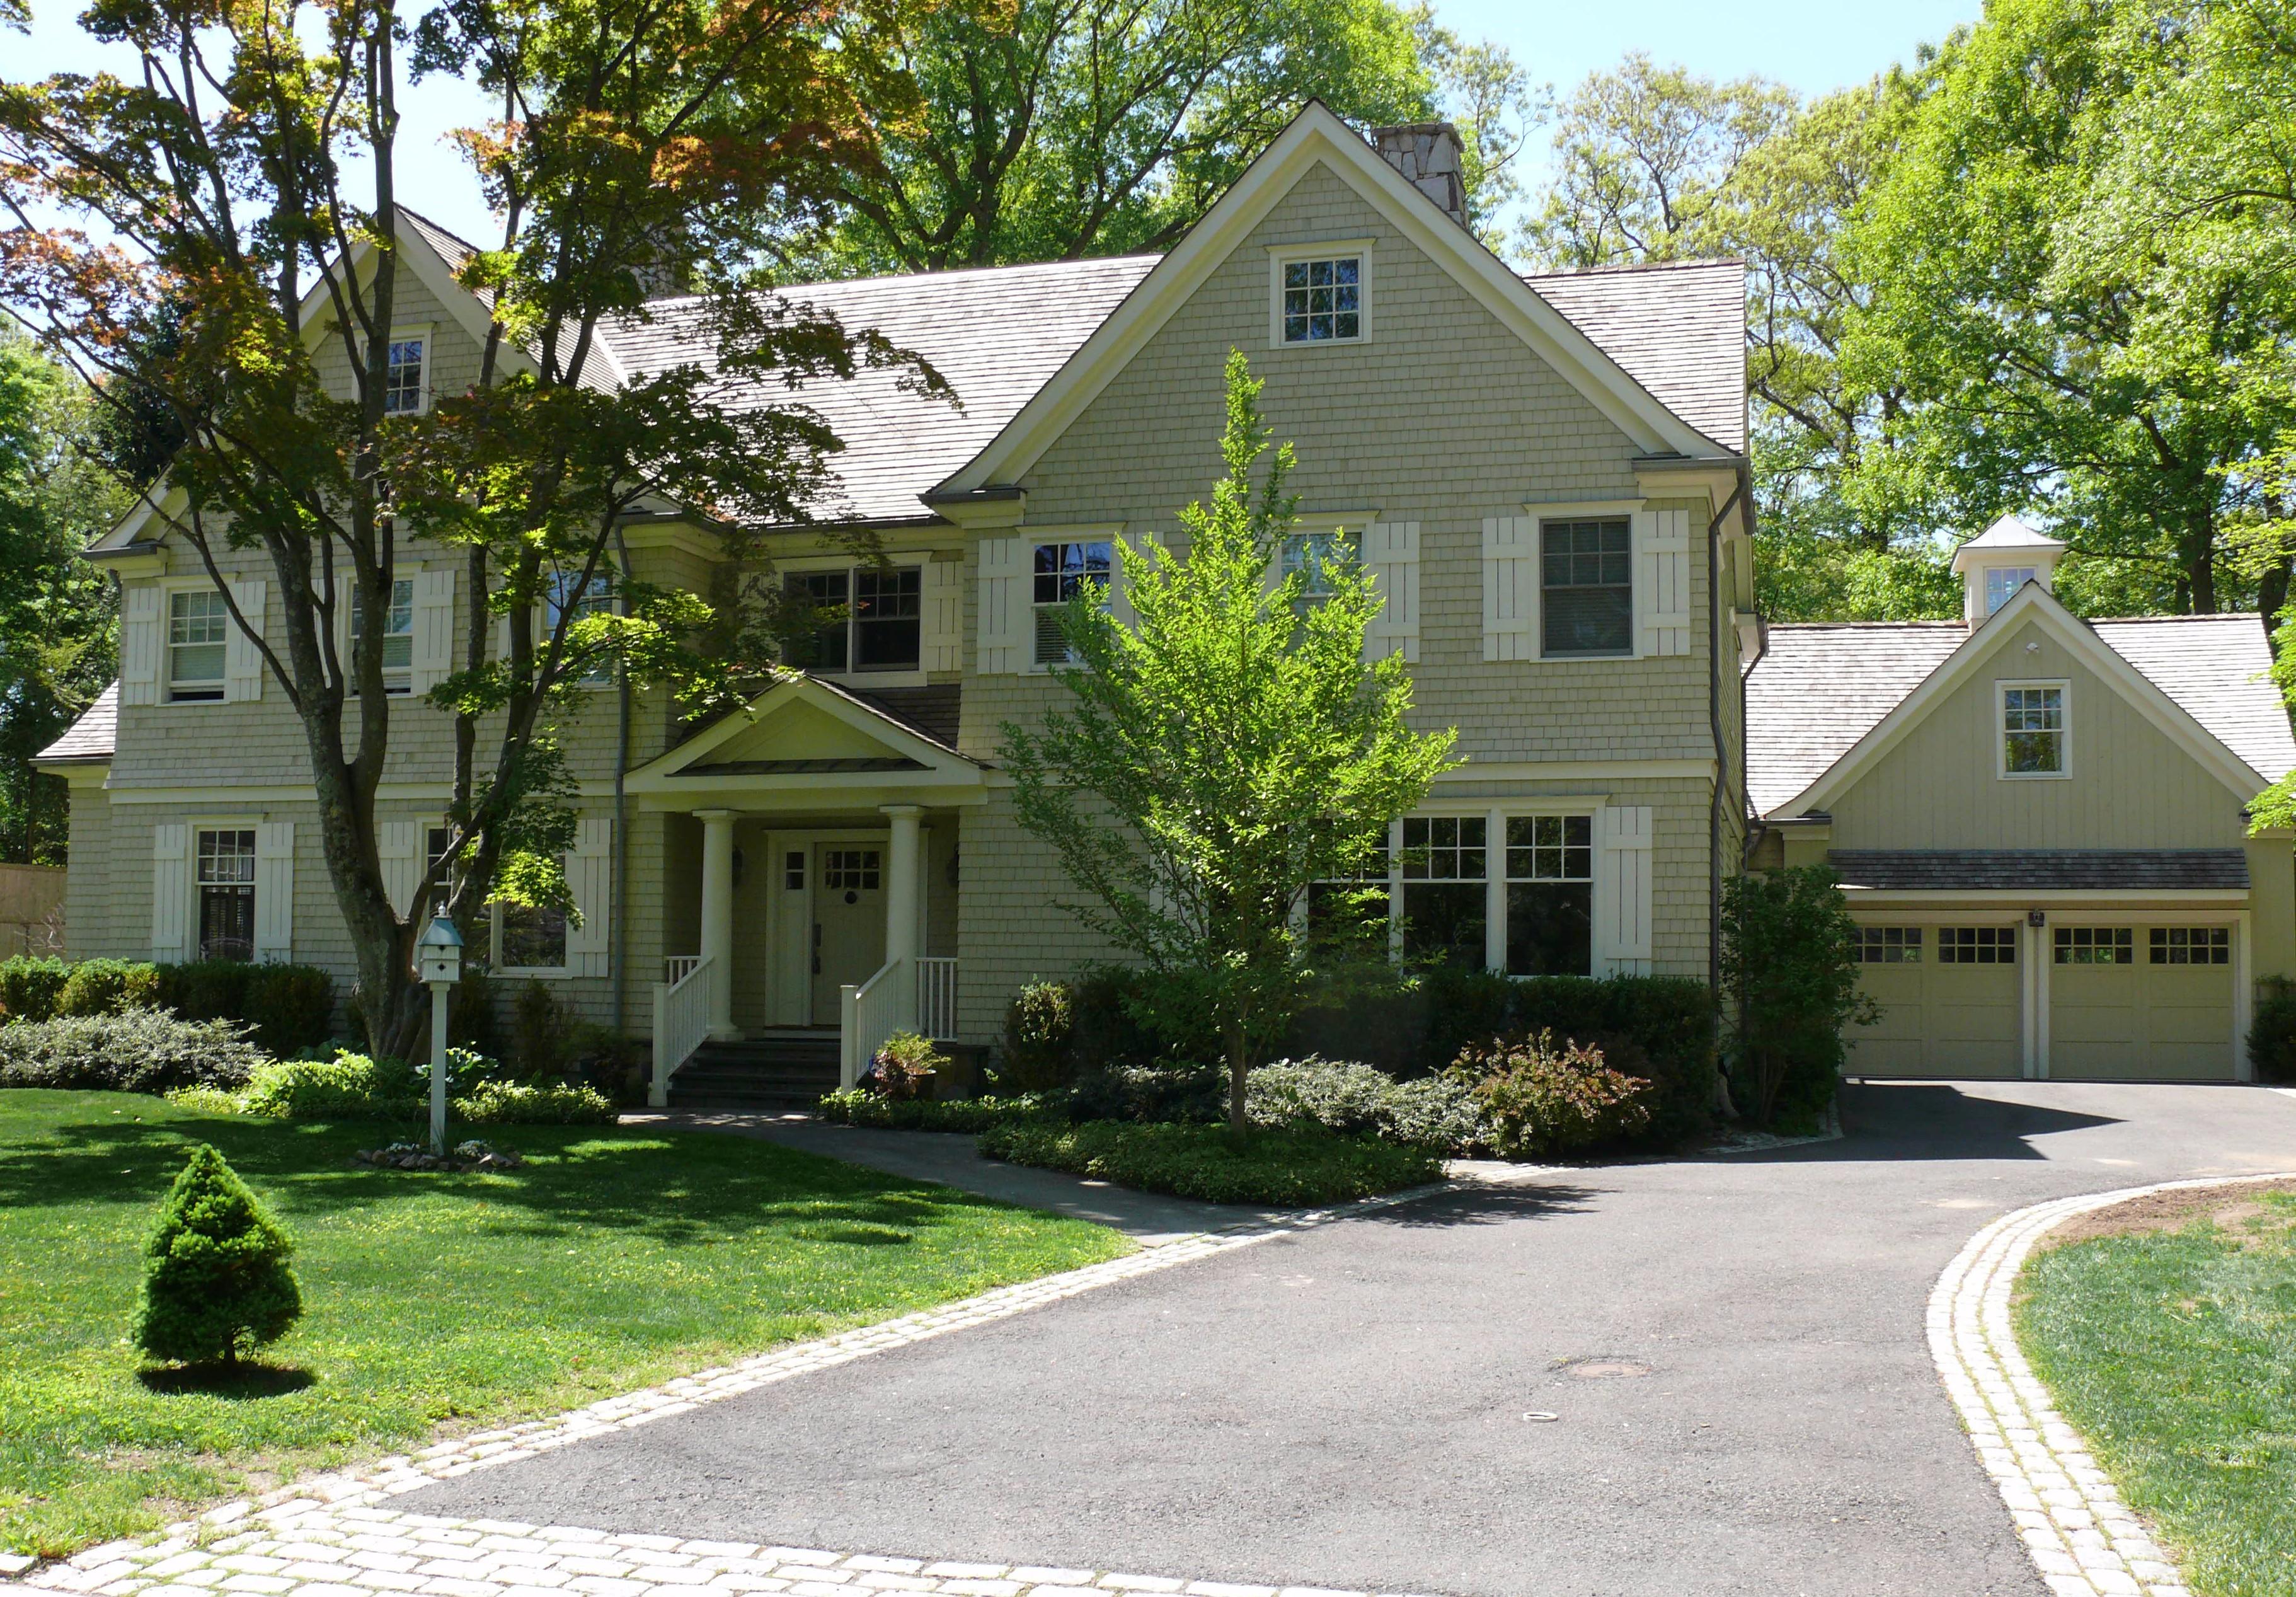 独户住宅 为 销售 在 Sophisticated New England Coastal Lifestyle 7 Ledge Road Rowayton, Norwalk, 康涅狄格州 06853 美国